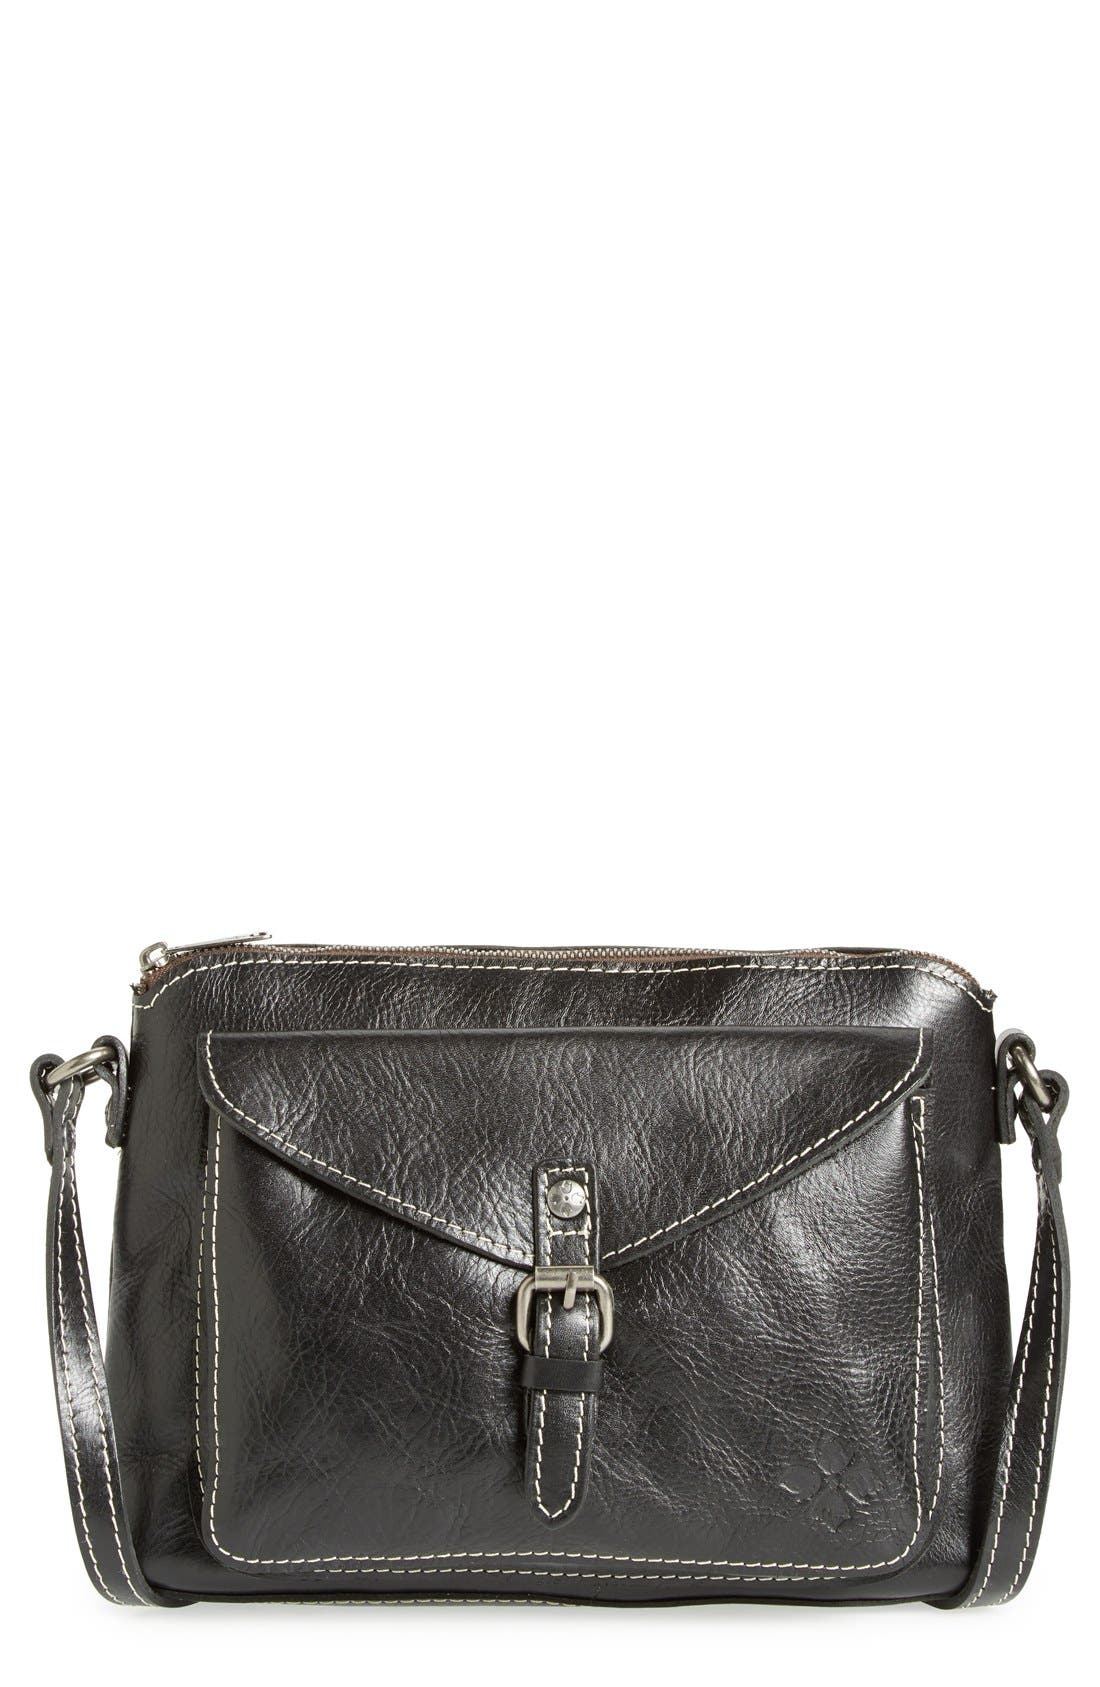 'Avellino' Crossbody Bag, Main, color, 001